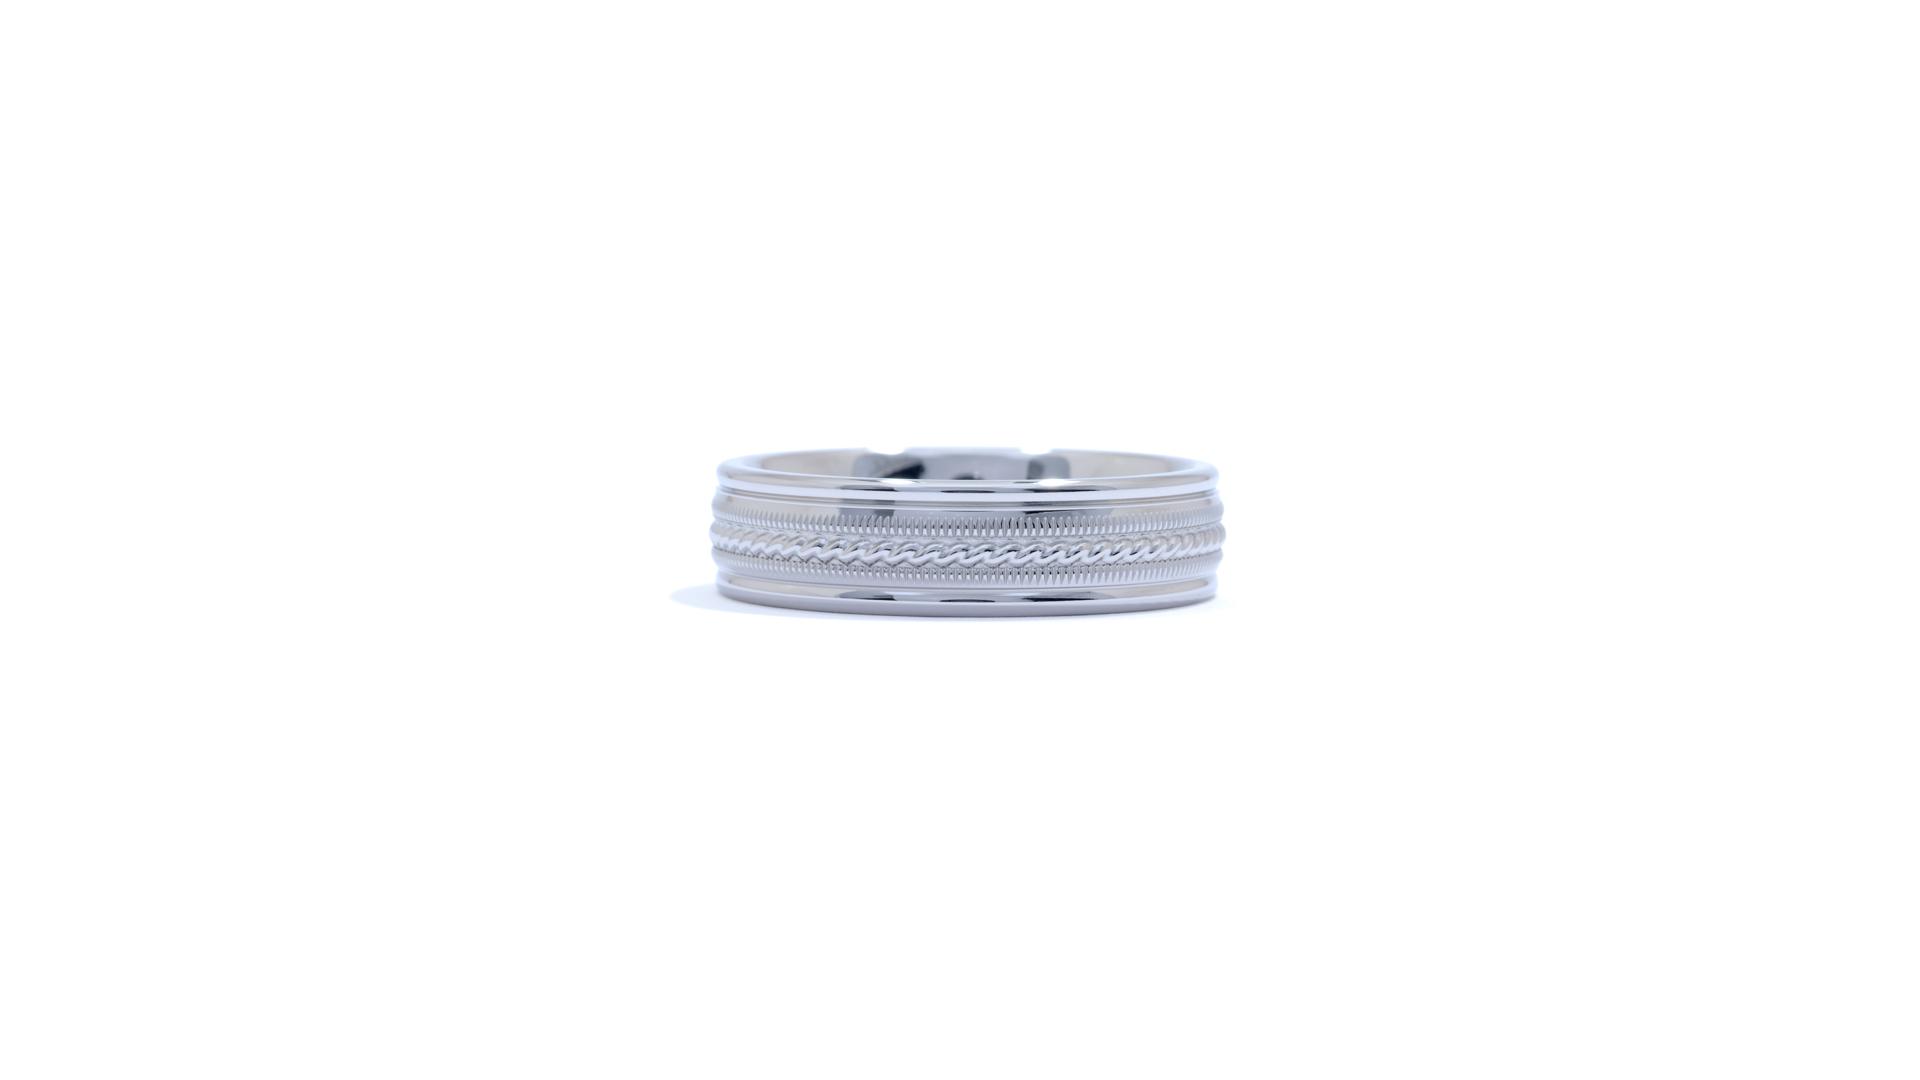 ja3689 - Rope and Millgrain Men's Wedding Band at Ascot Diamonds